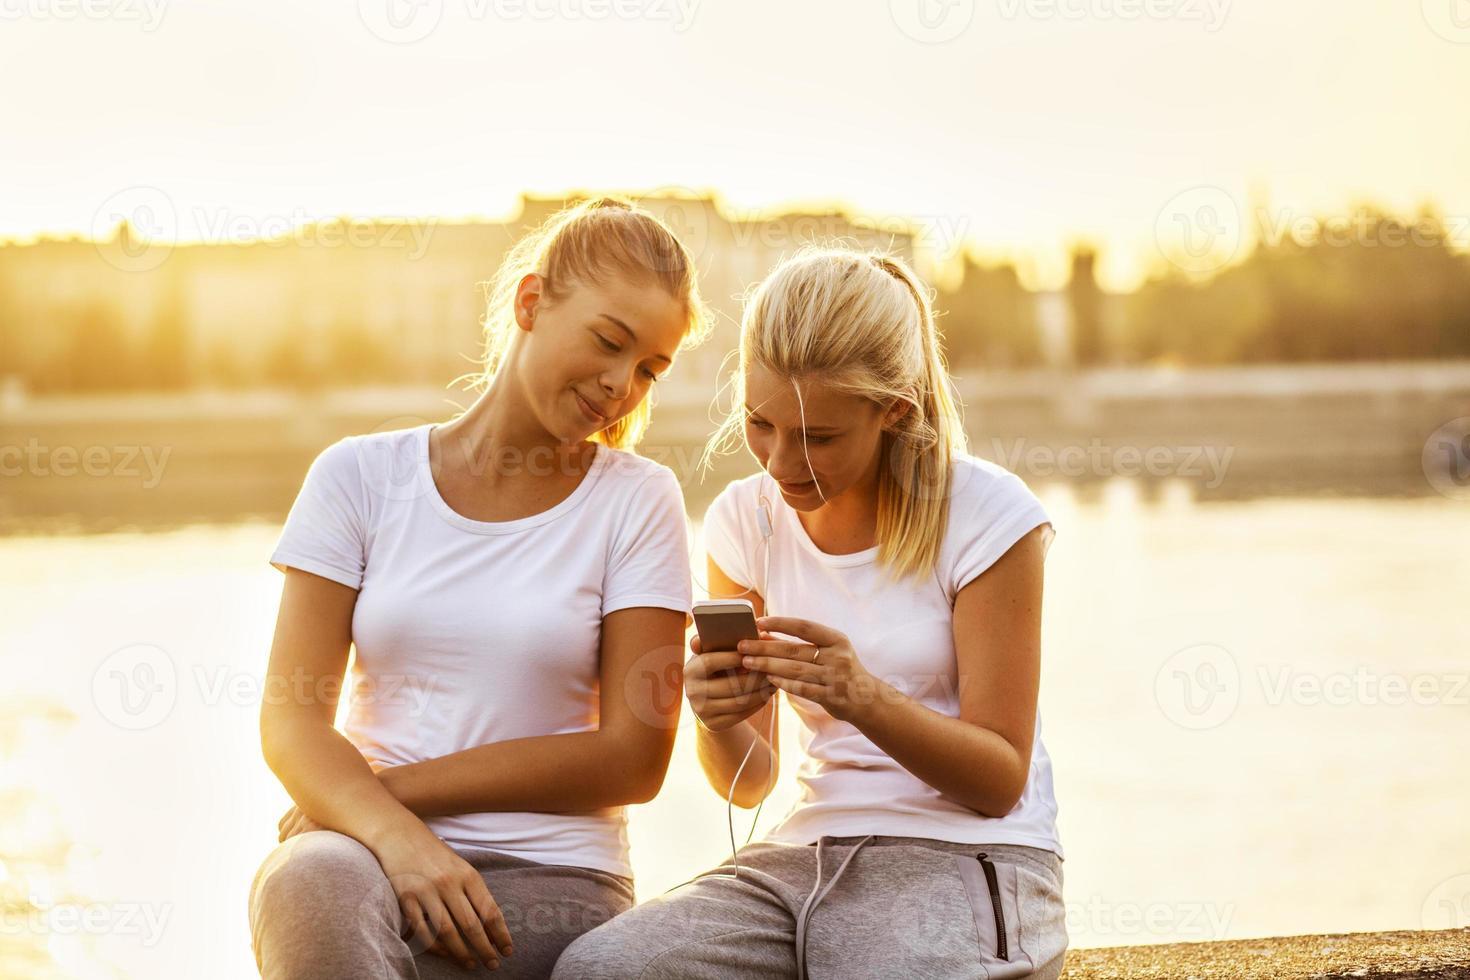 vriendschap, twee meisjes die lol hebben foto